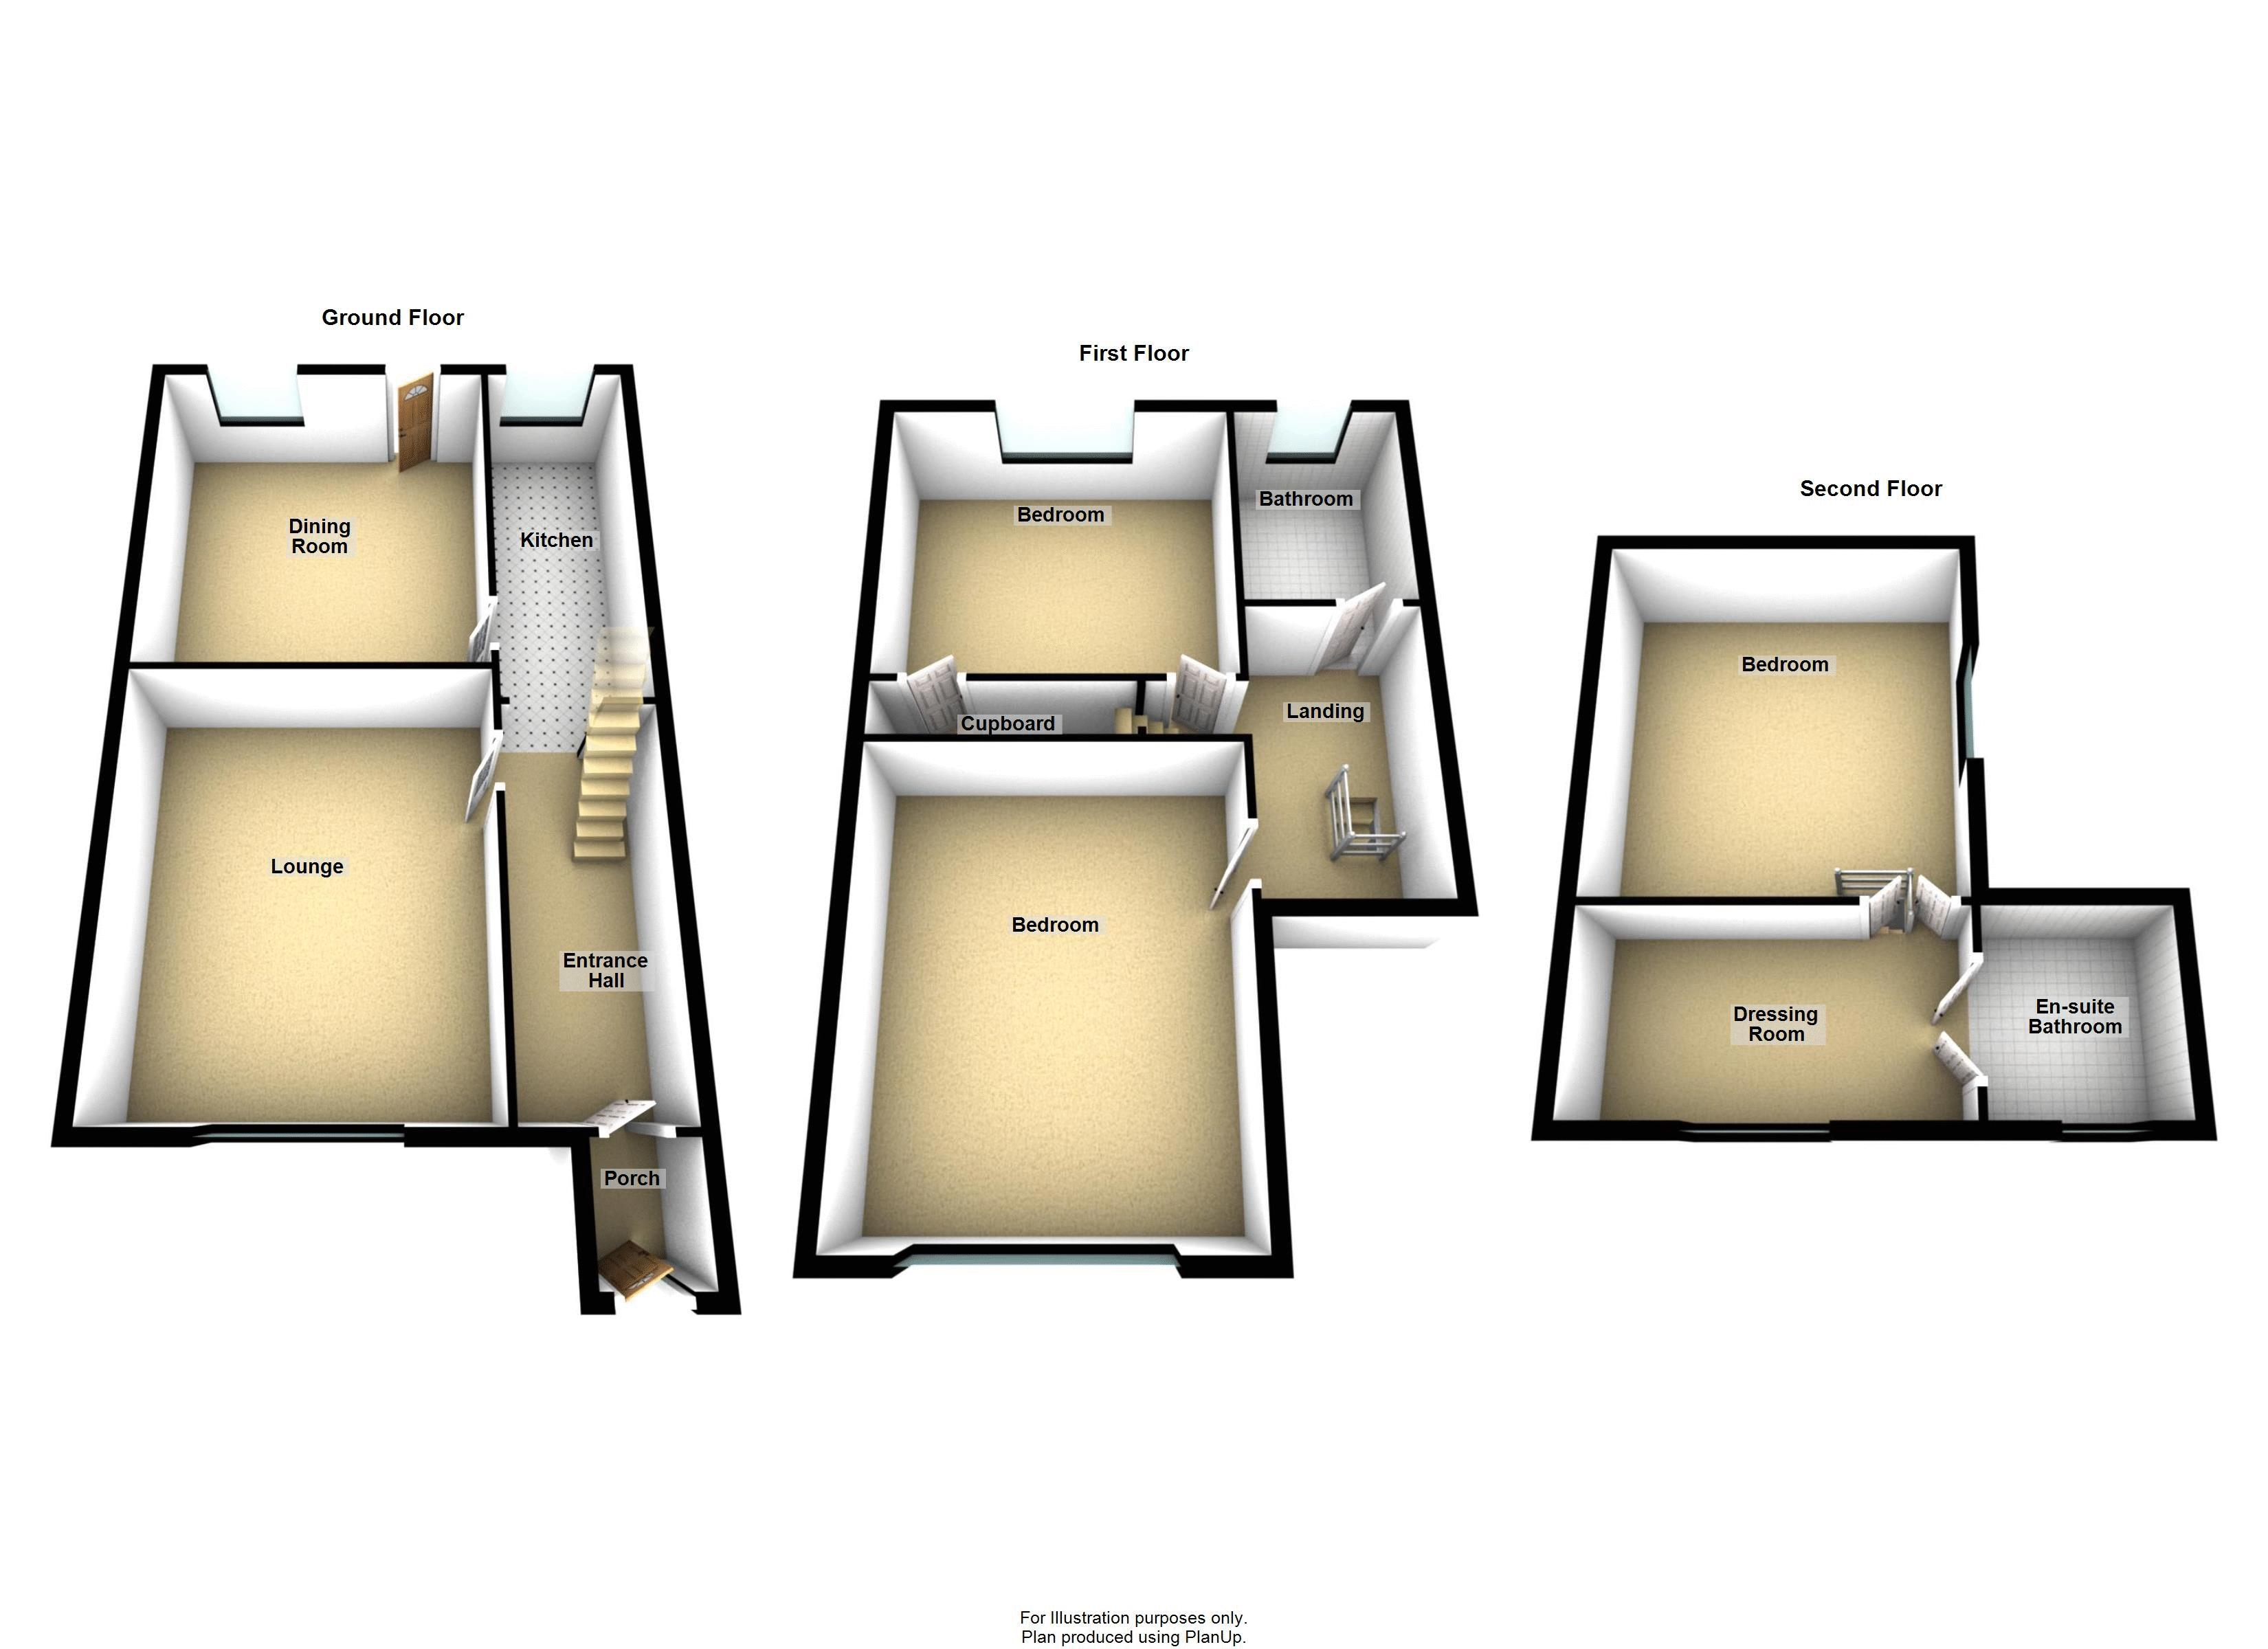 42A Smiddles Lane Floorplan